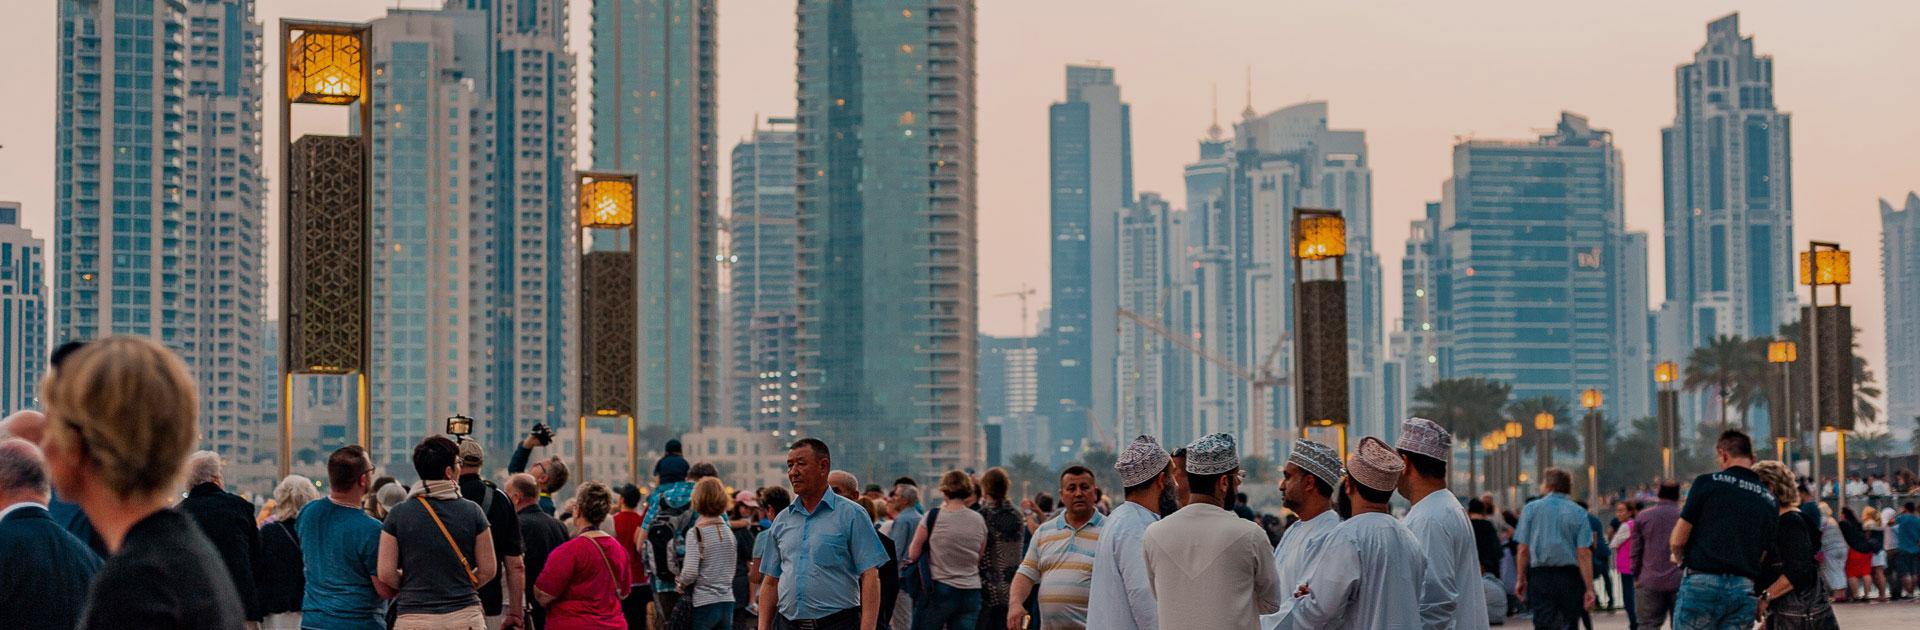 AEMV Estancia en Dubai y Maldivas 11 días 5